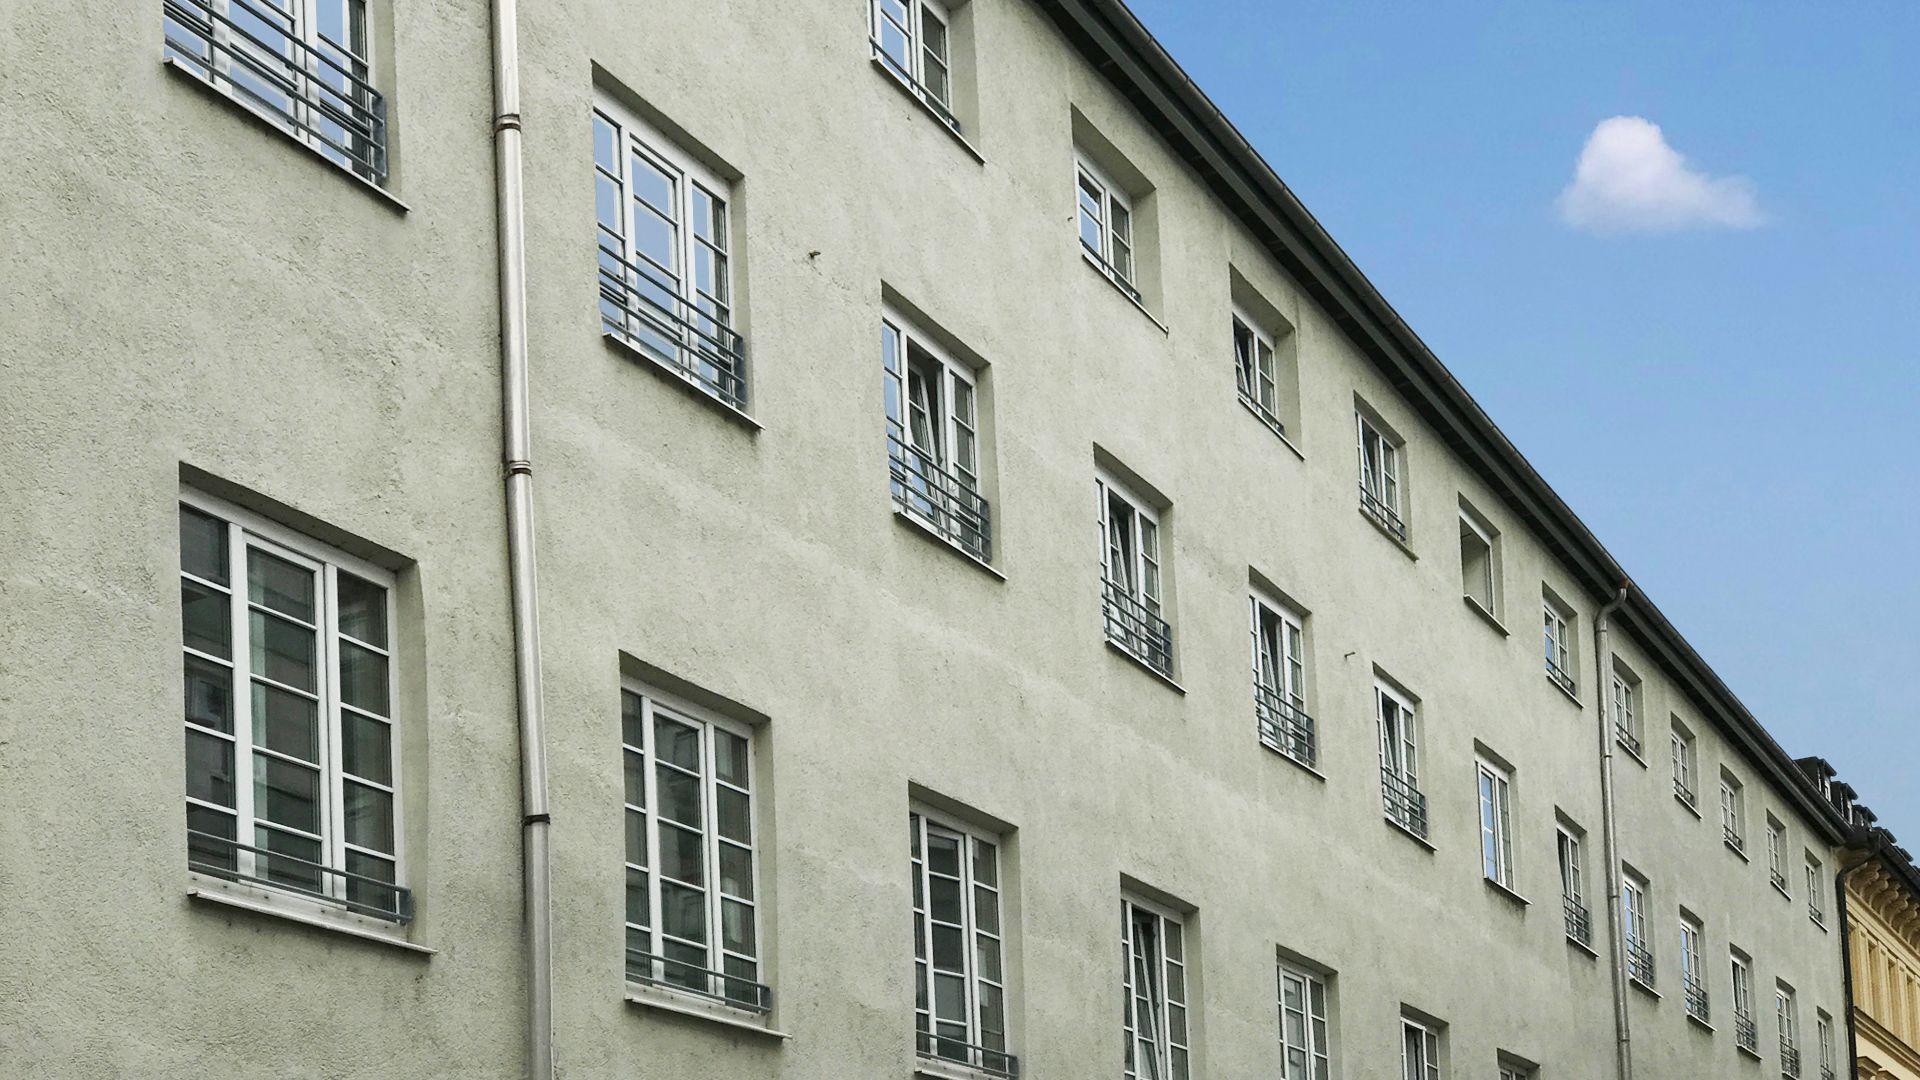 Dachwerk, Munich